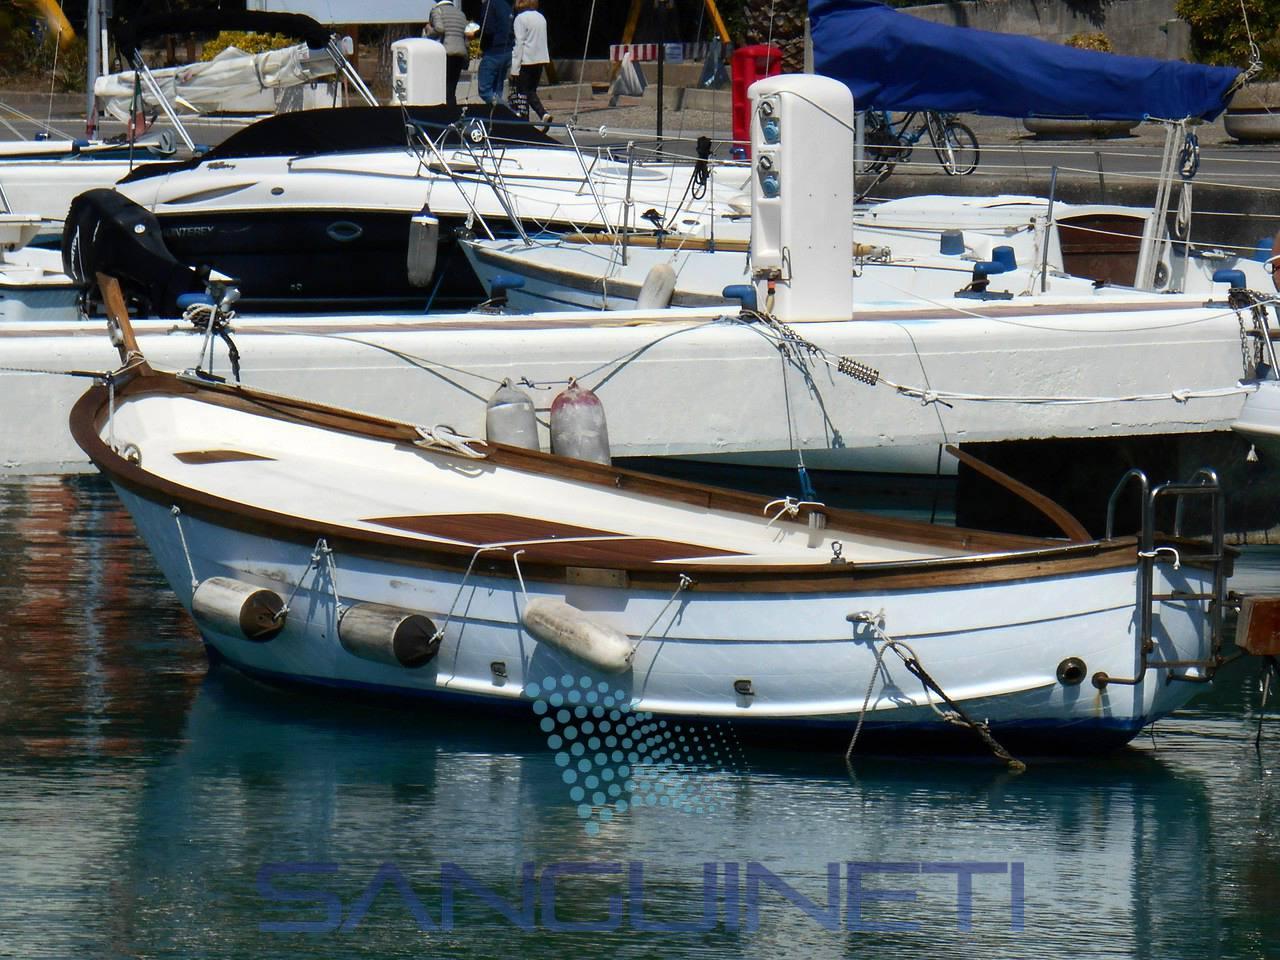 Ruocco Armonia barca a motore